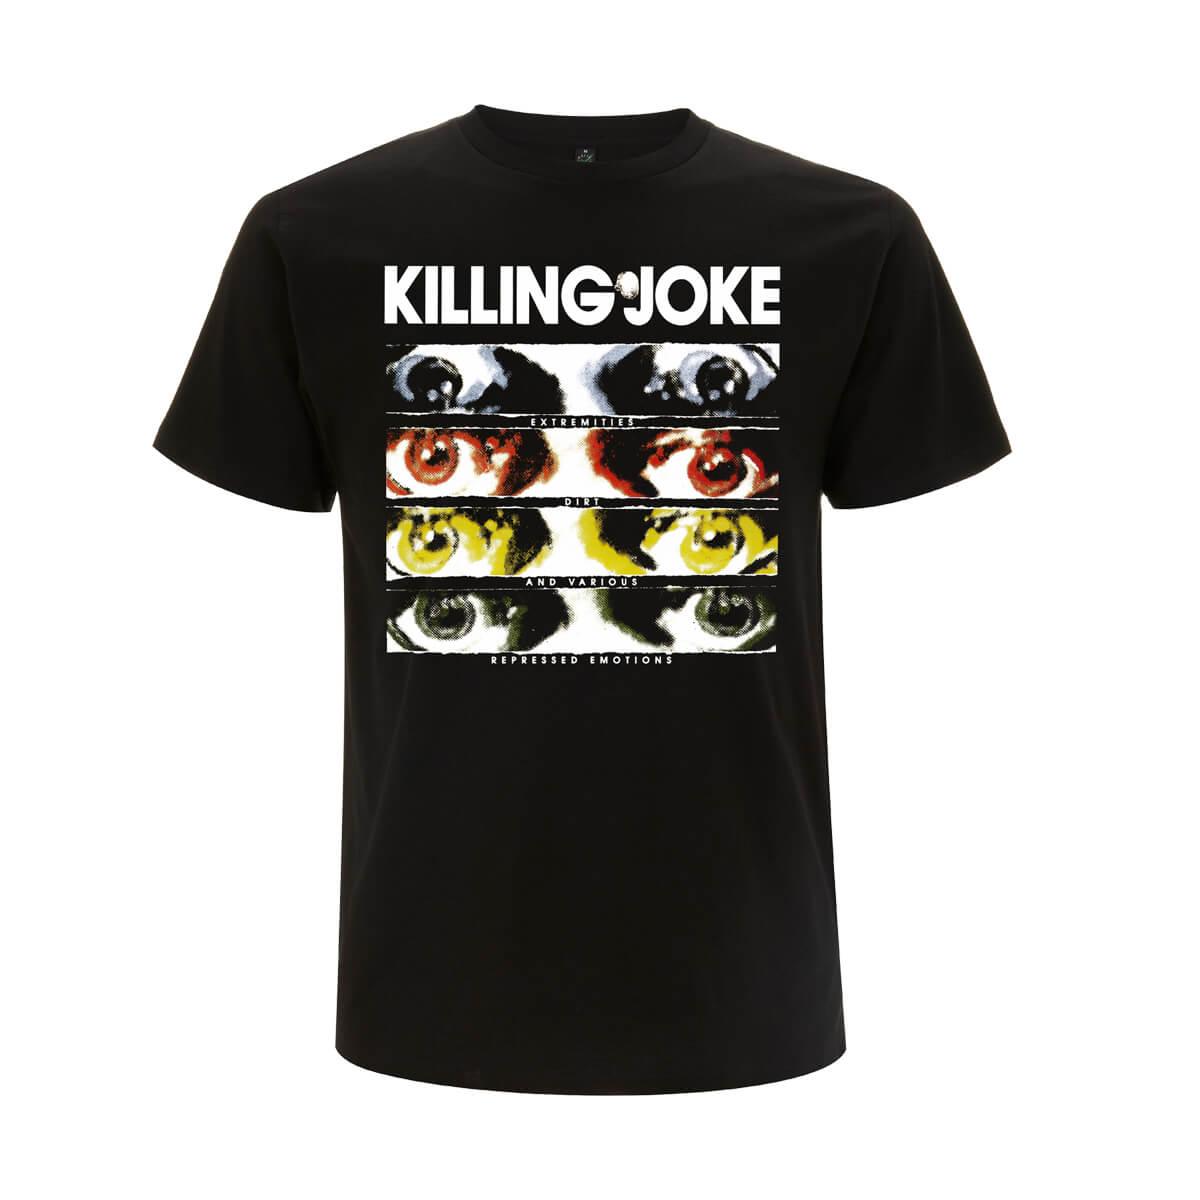 Extremities Black T-Shirt - Killing Joke